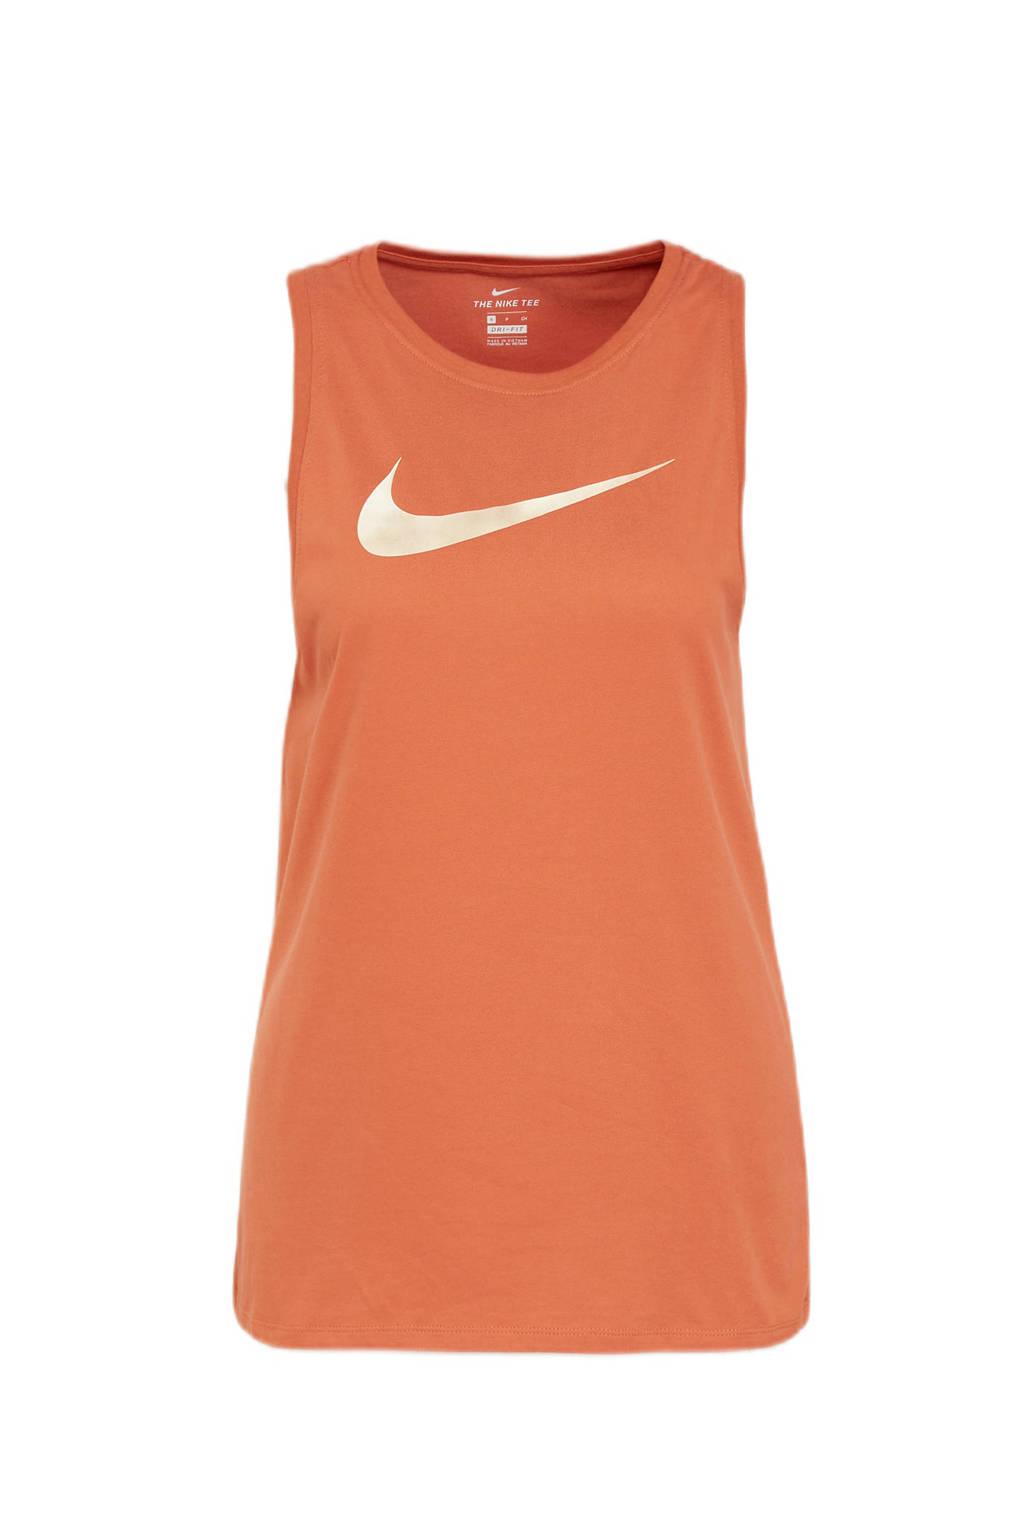 Nike sporttop oranje, Oranje